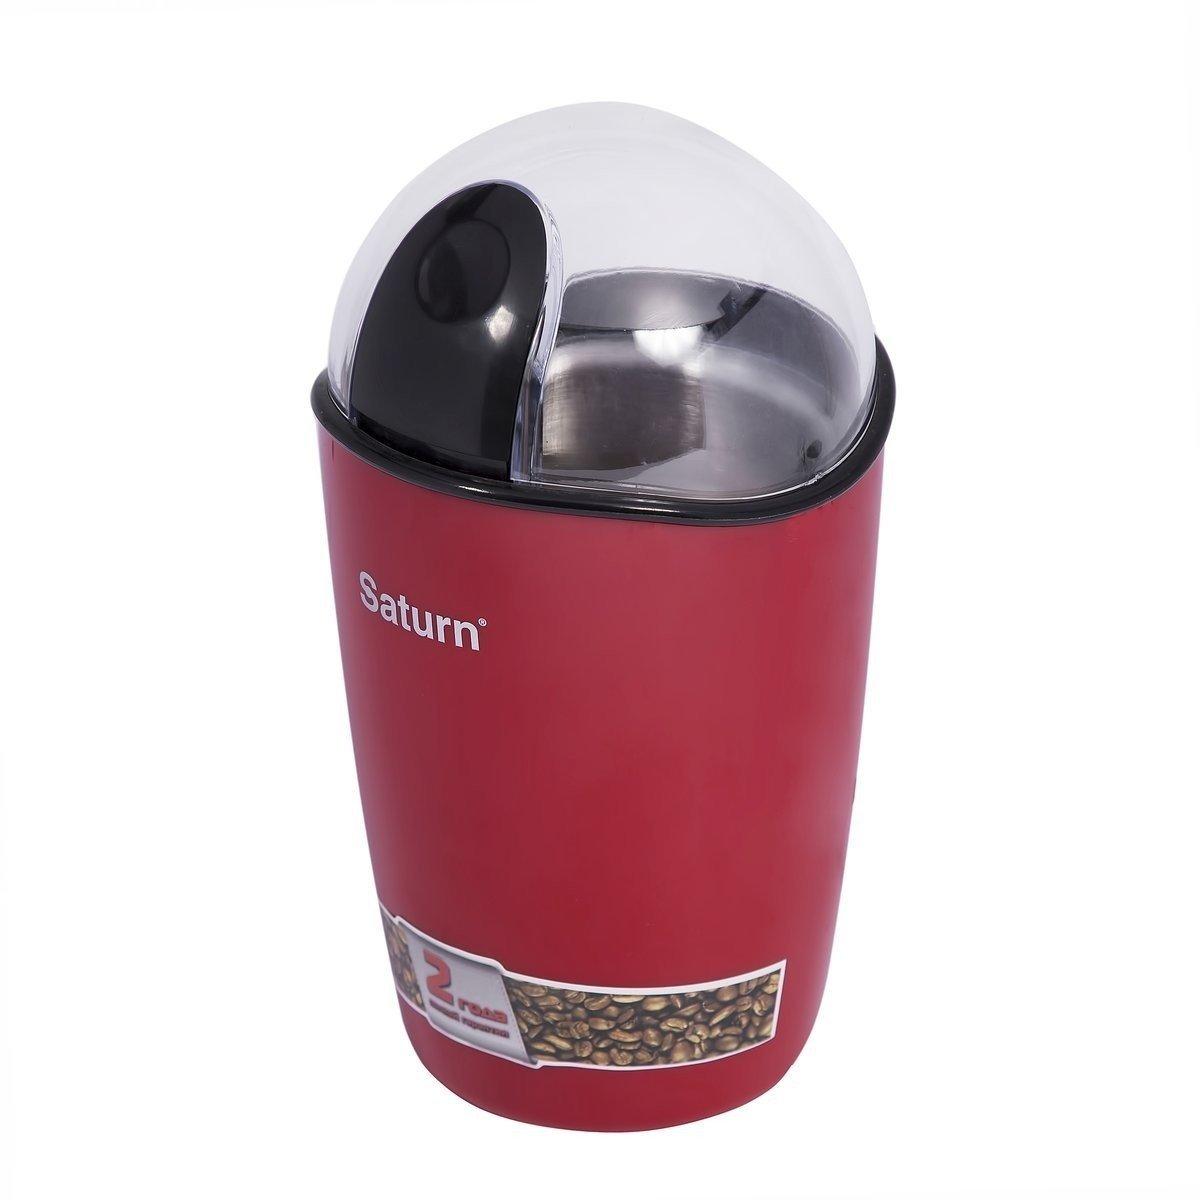 ≡ Кавомолка Saturn ST-CM0176 Red – купити в Києві  b29ea4d2e908f